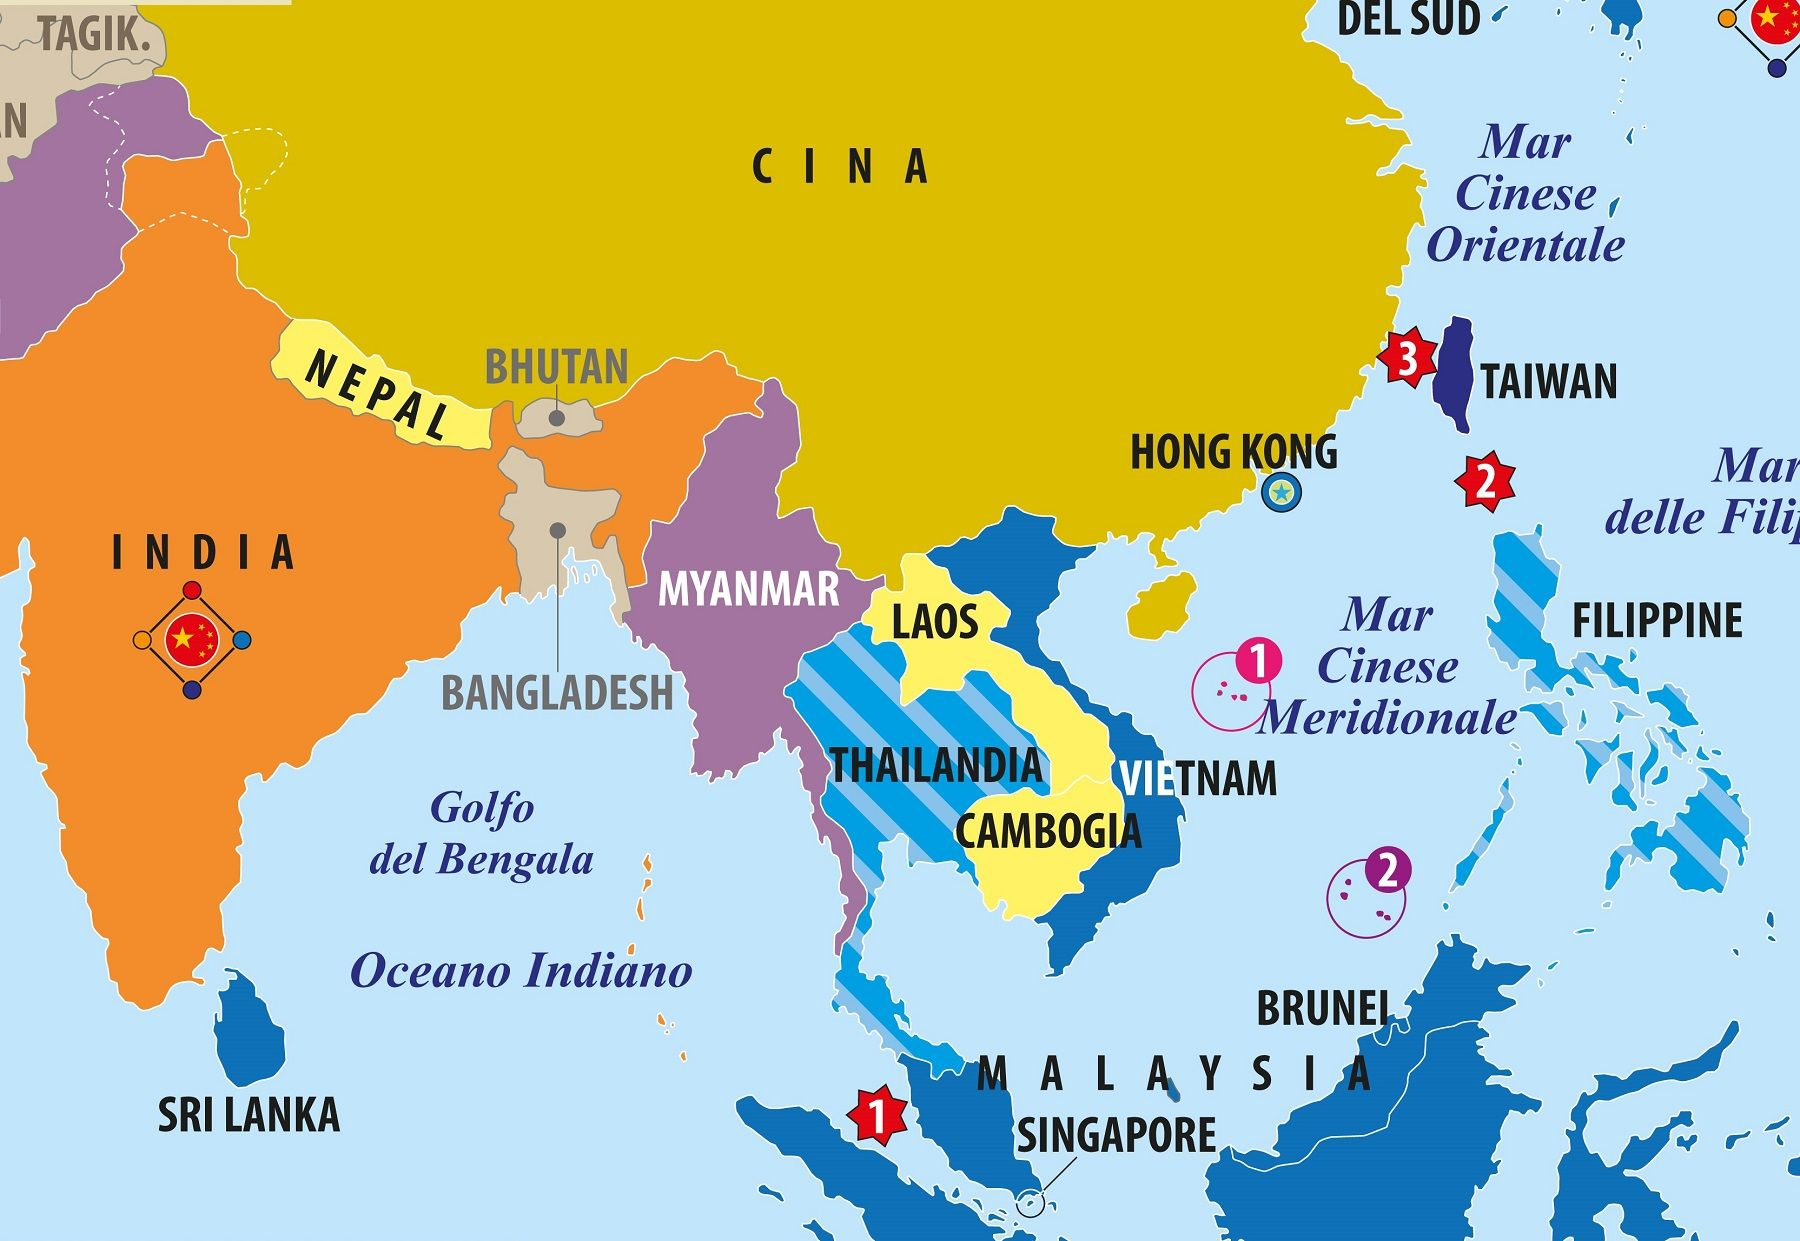 Cartina Geografica Europa Meridionale.Carta Del Sud Est Asiatico Vietnam Laos Cambogia Cina Limes